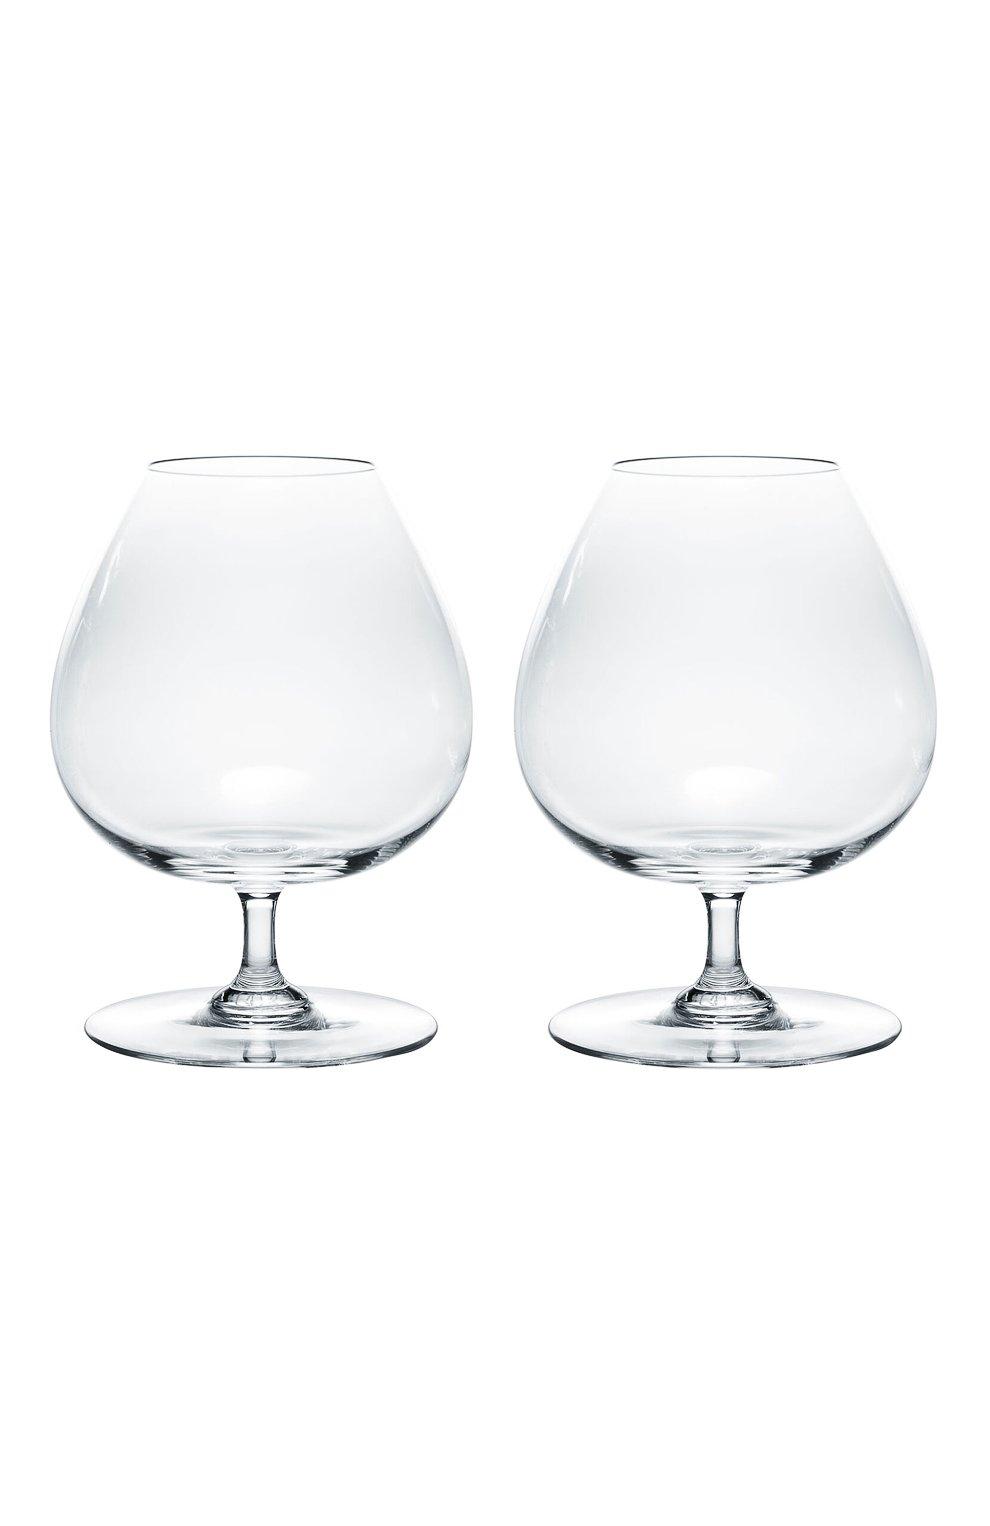 Мужского набор из 2-х бокалов для коньяка degustation №1 BACCARAT прозрачного цвета, арт. 2 811 794 | Фото 1